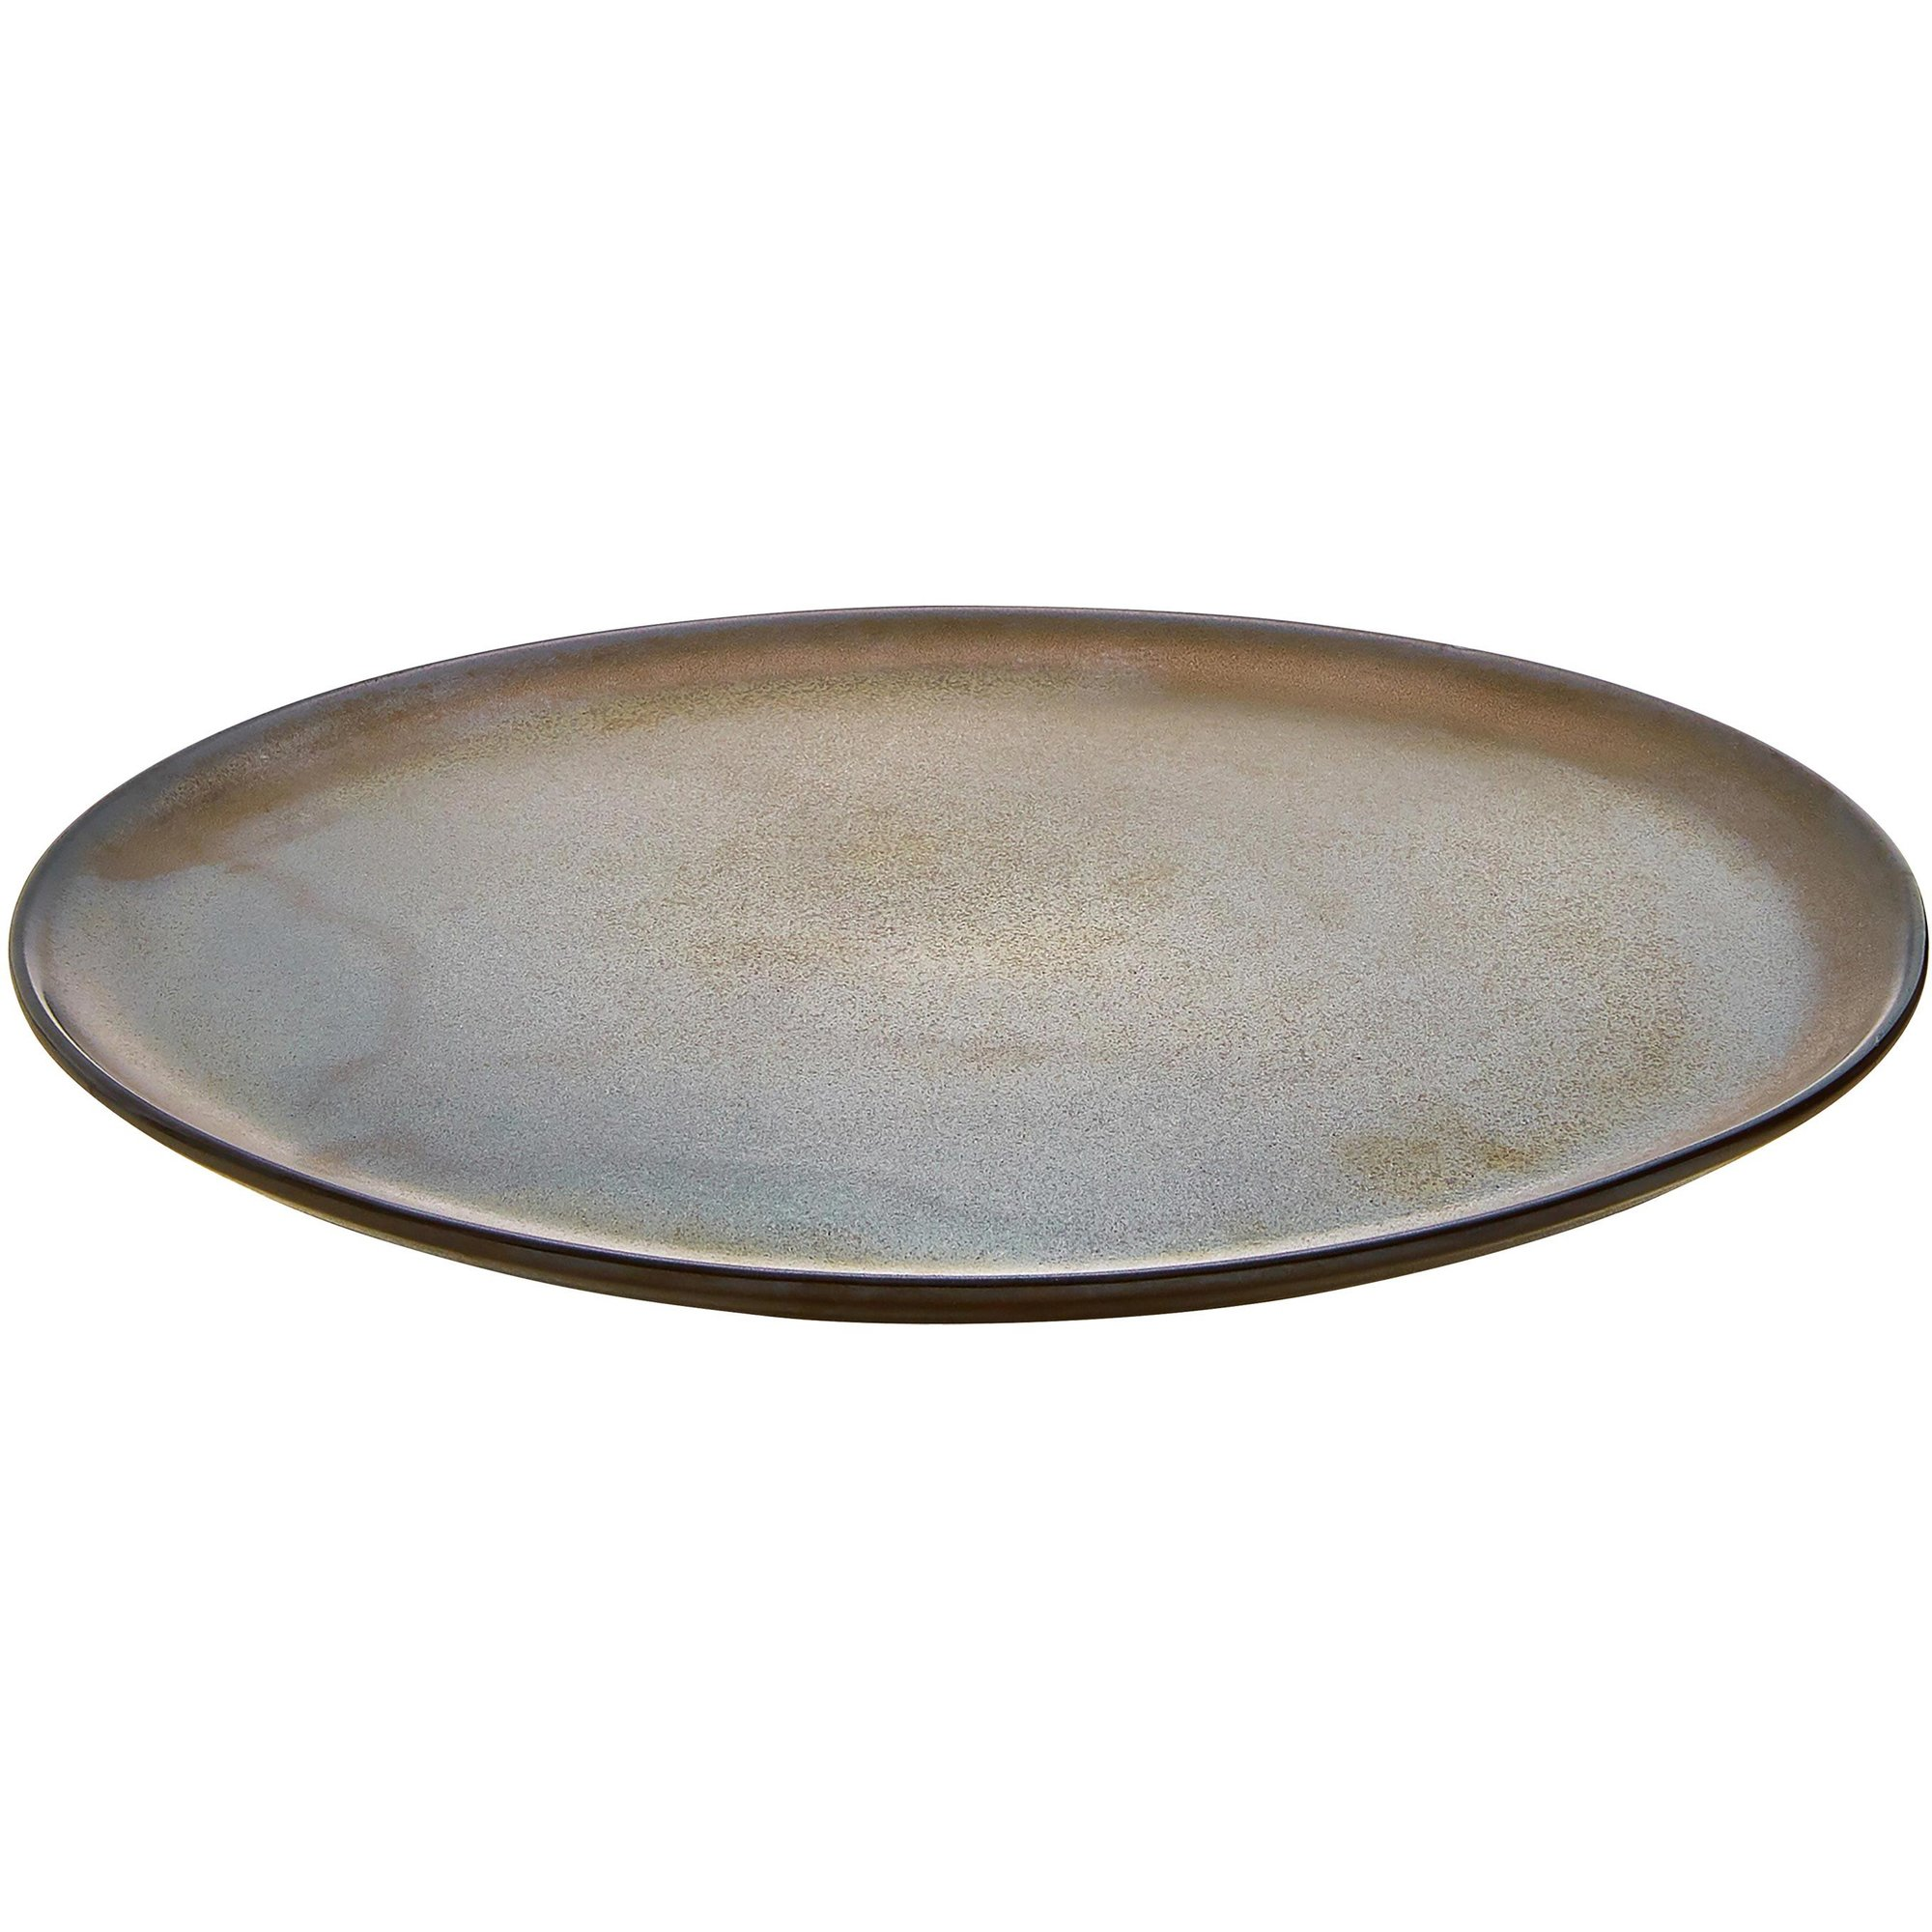 Aida RAW tallrik metallisk brun